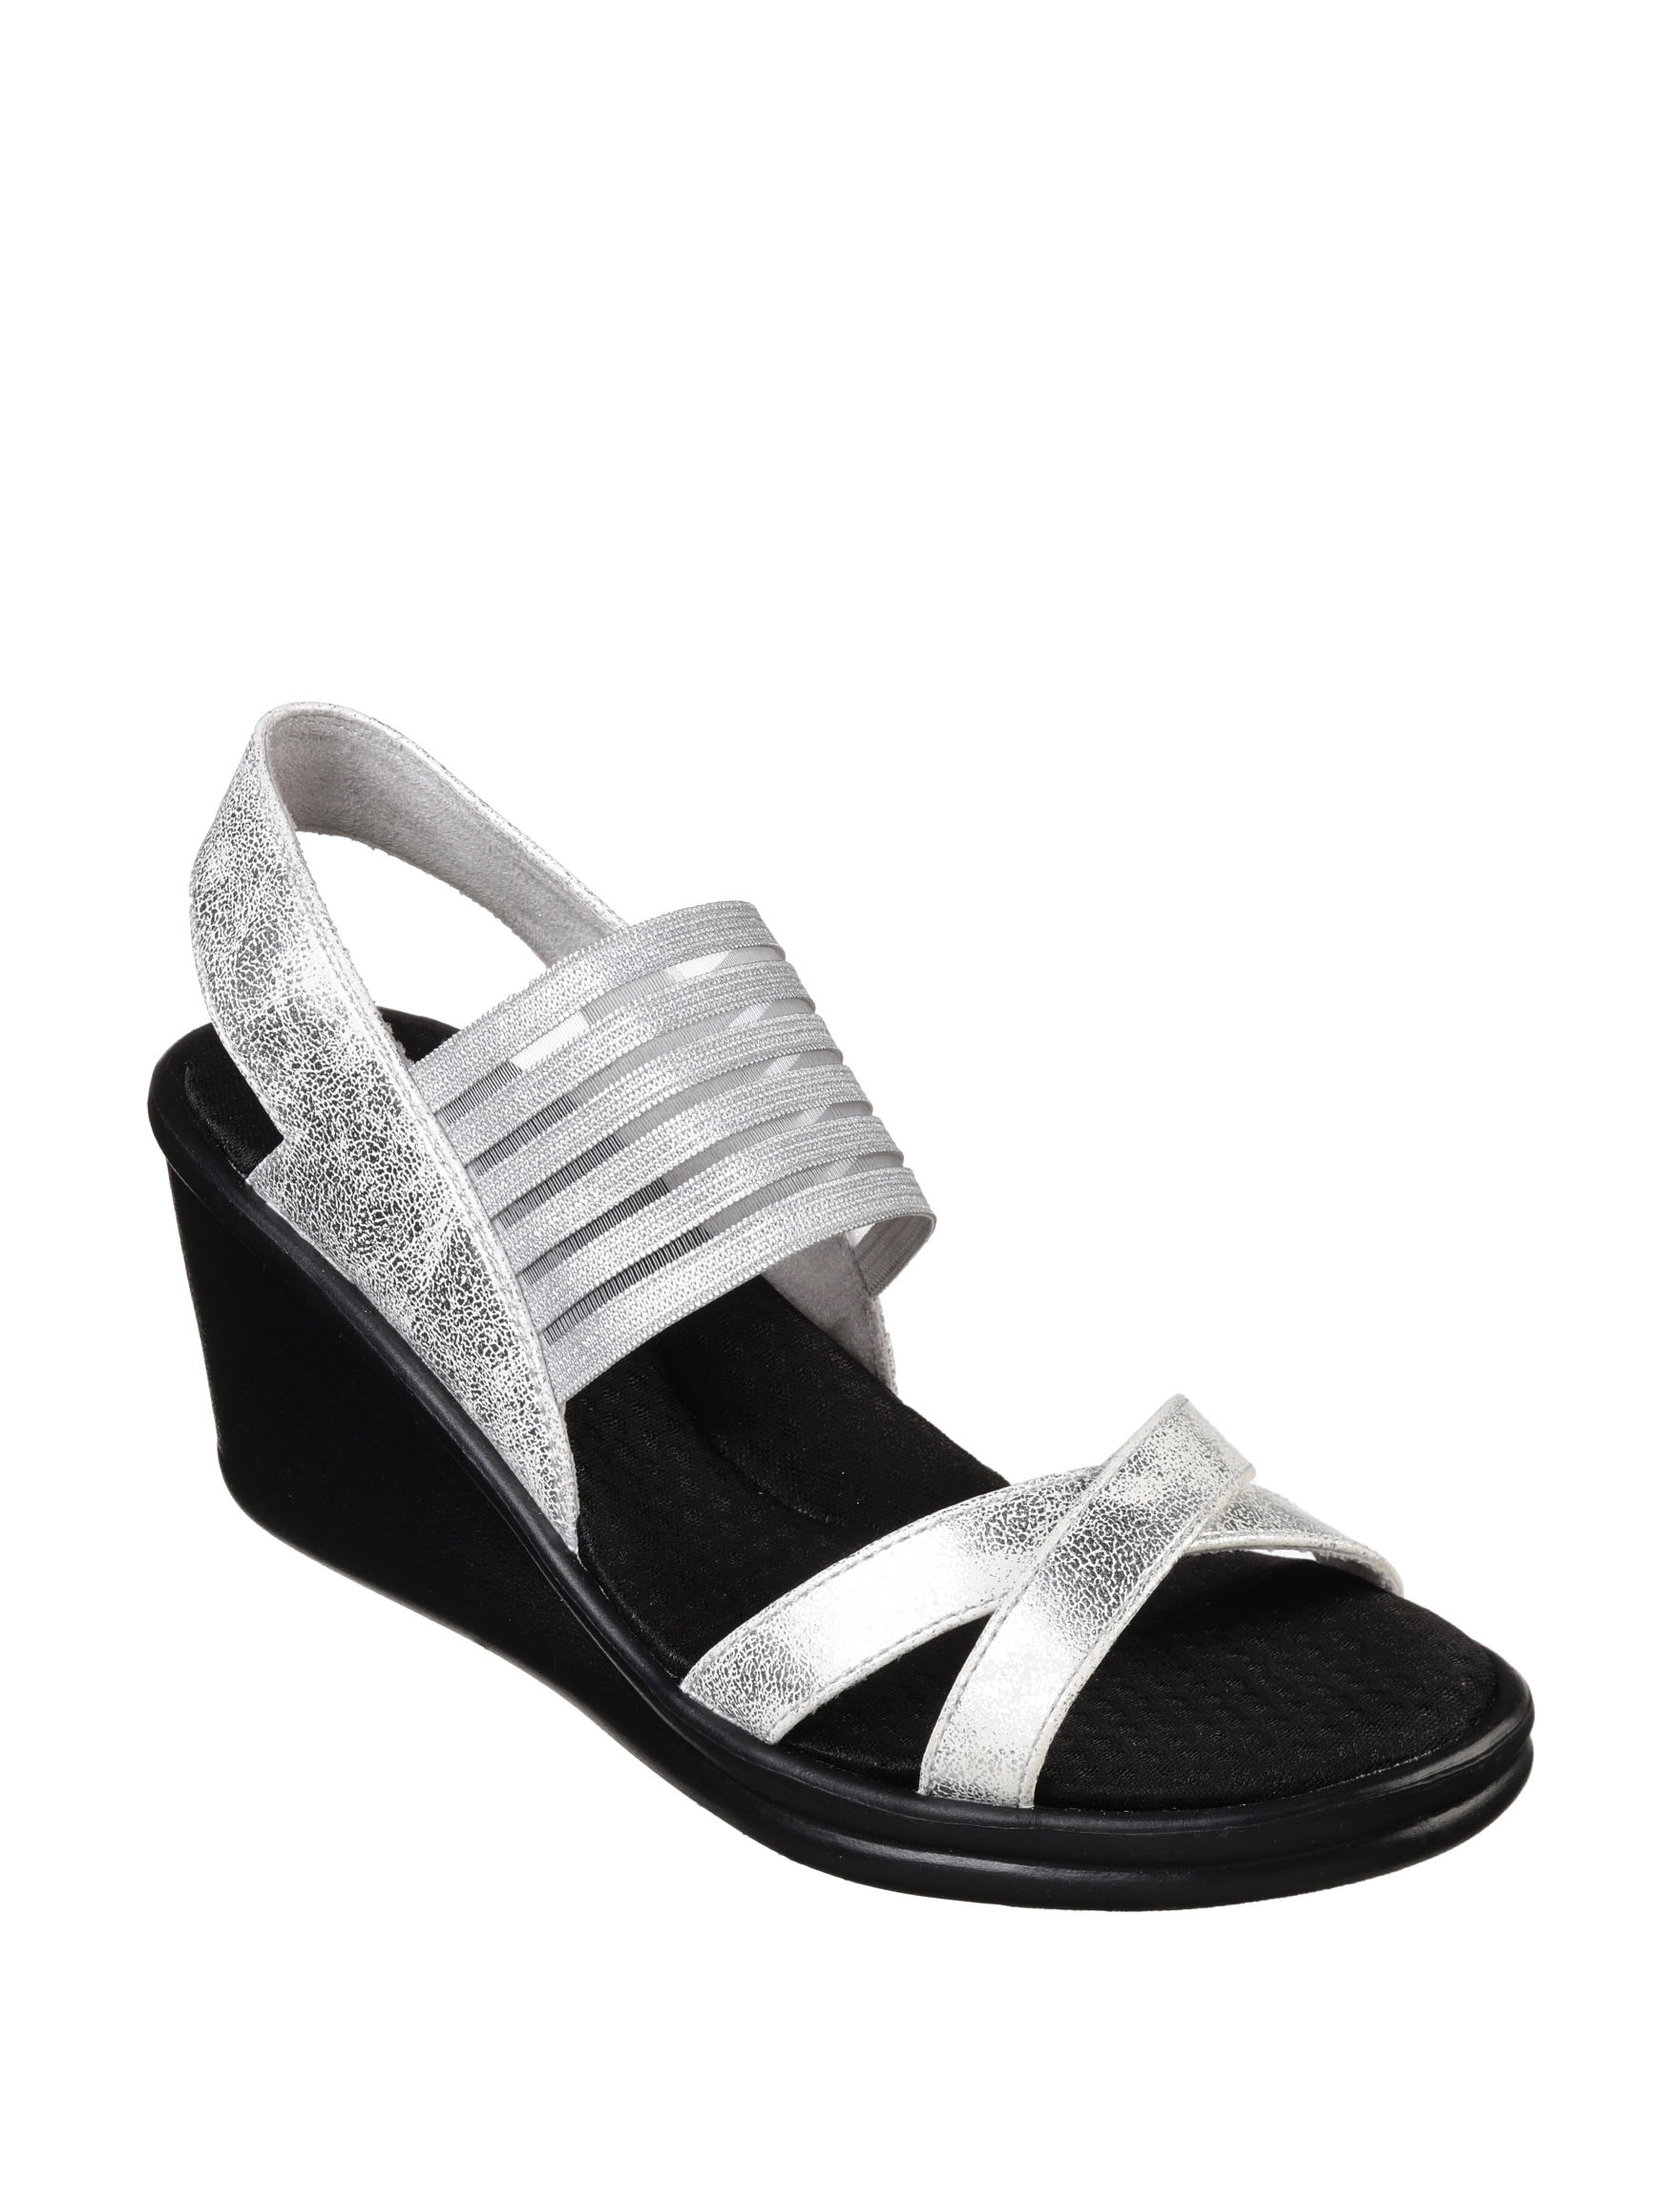 Skechers Silver Wedge Sandals